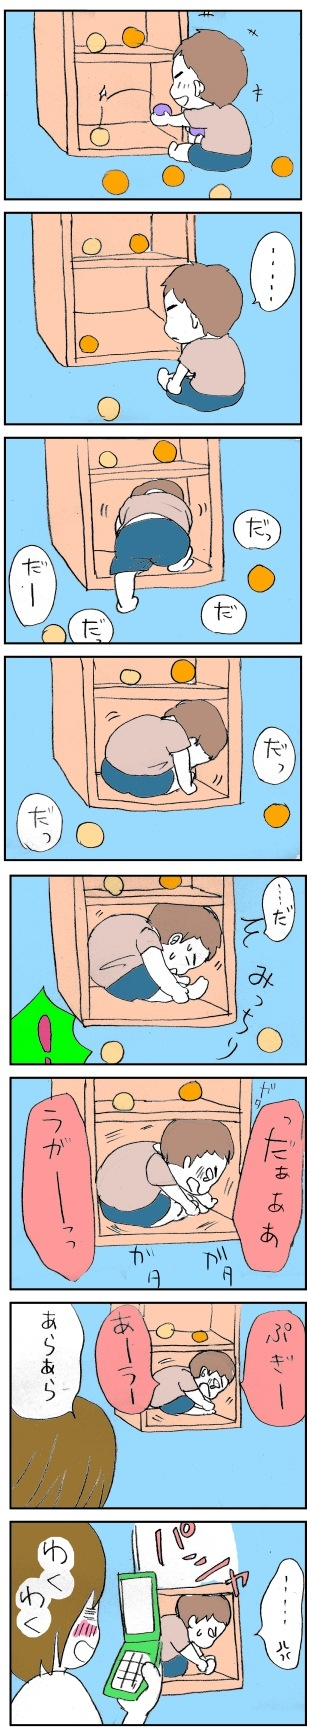 hasamaru.jpg